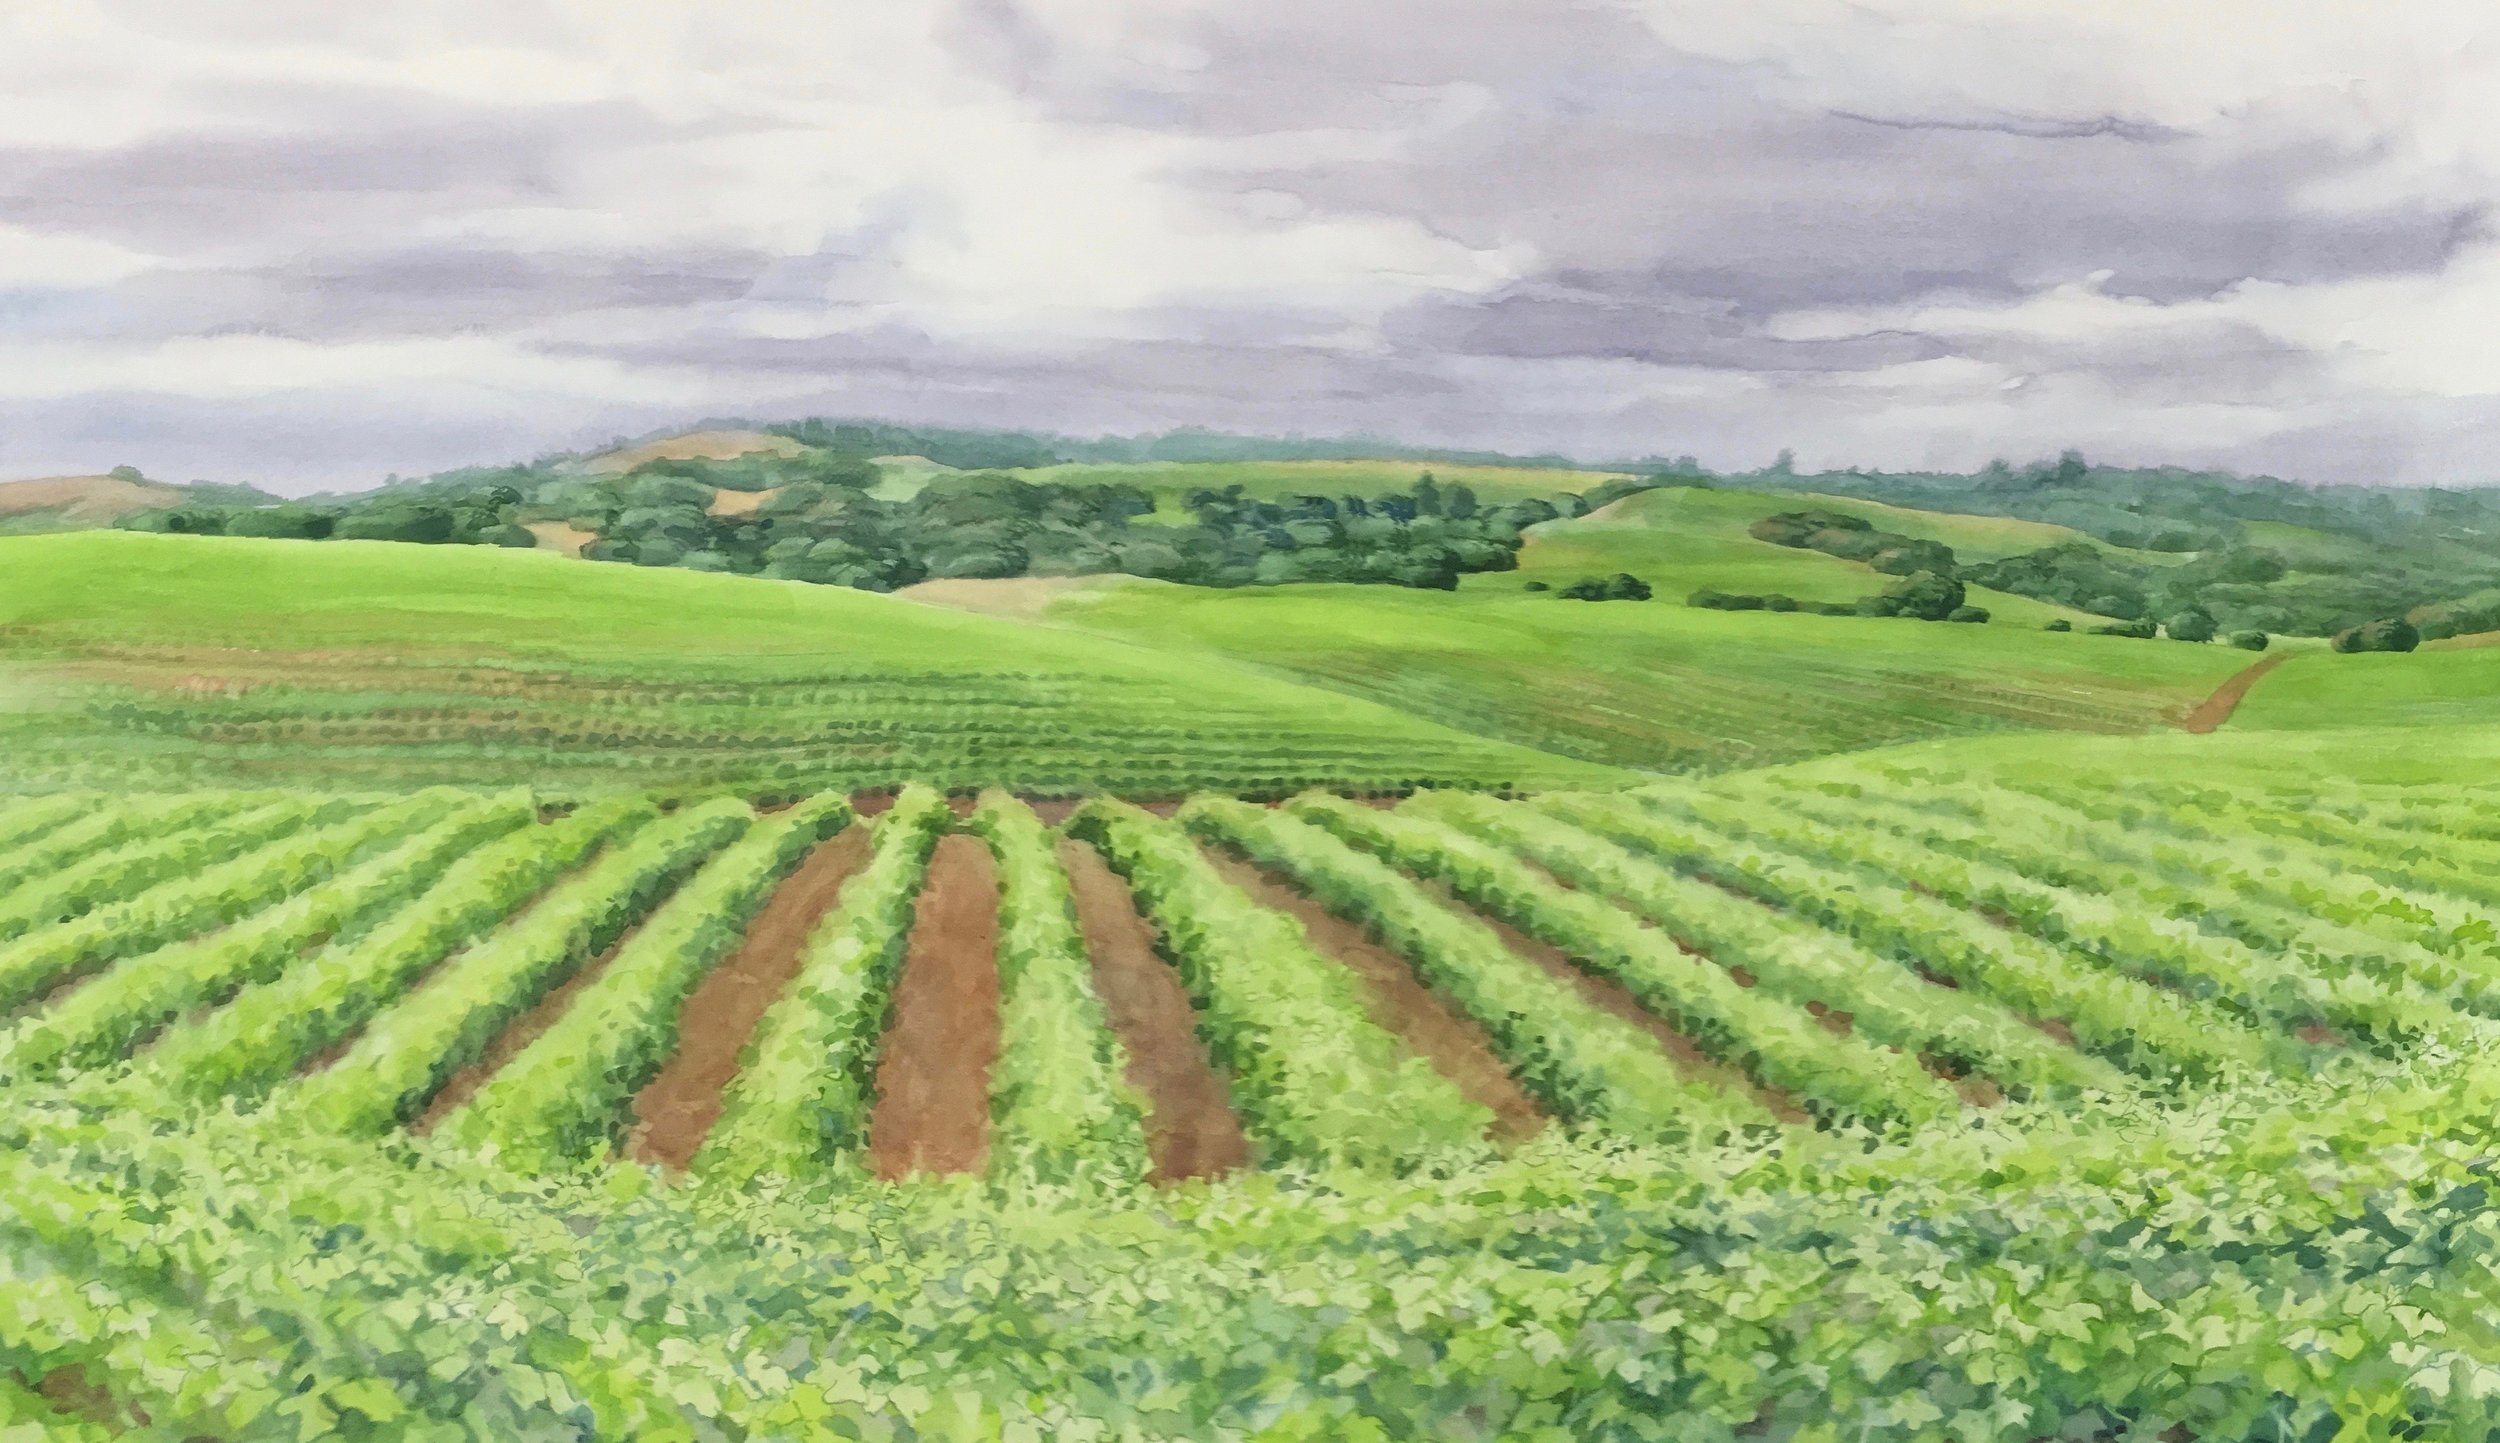 Title: Sonoma vinyard Year: 2016 Medium: PIGMENT PRINT Image size: 26 X 18 in.